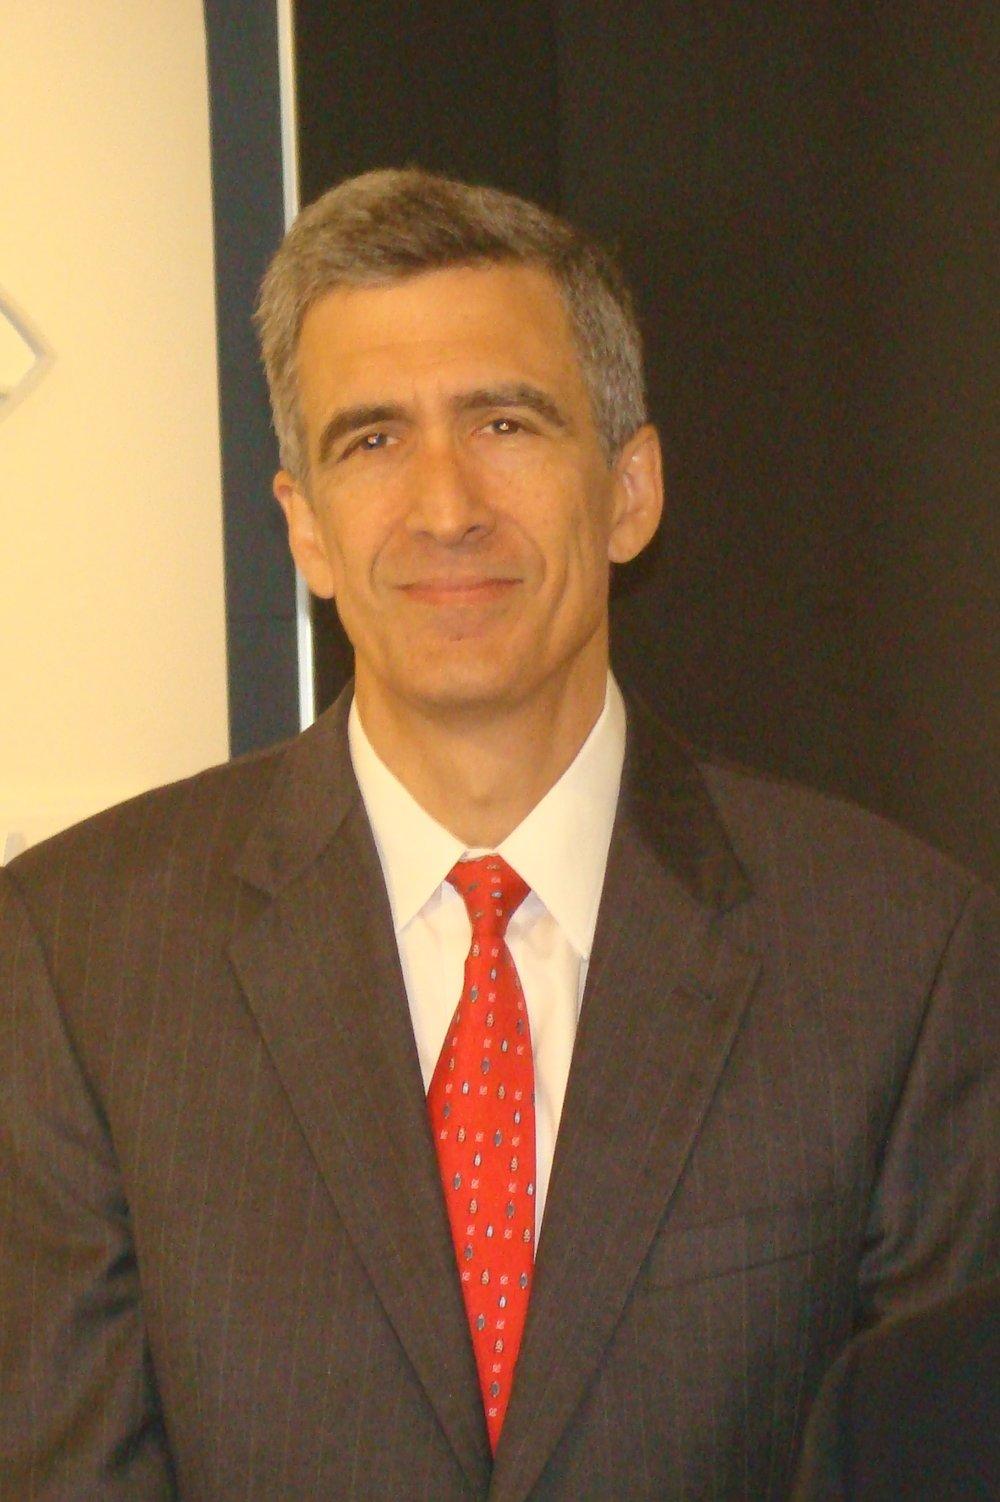 Pedro Heilbron - 1, 30 Oct '14.JPG